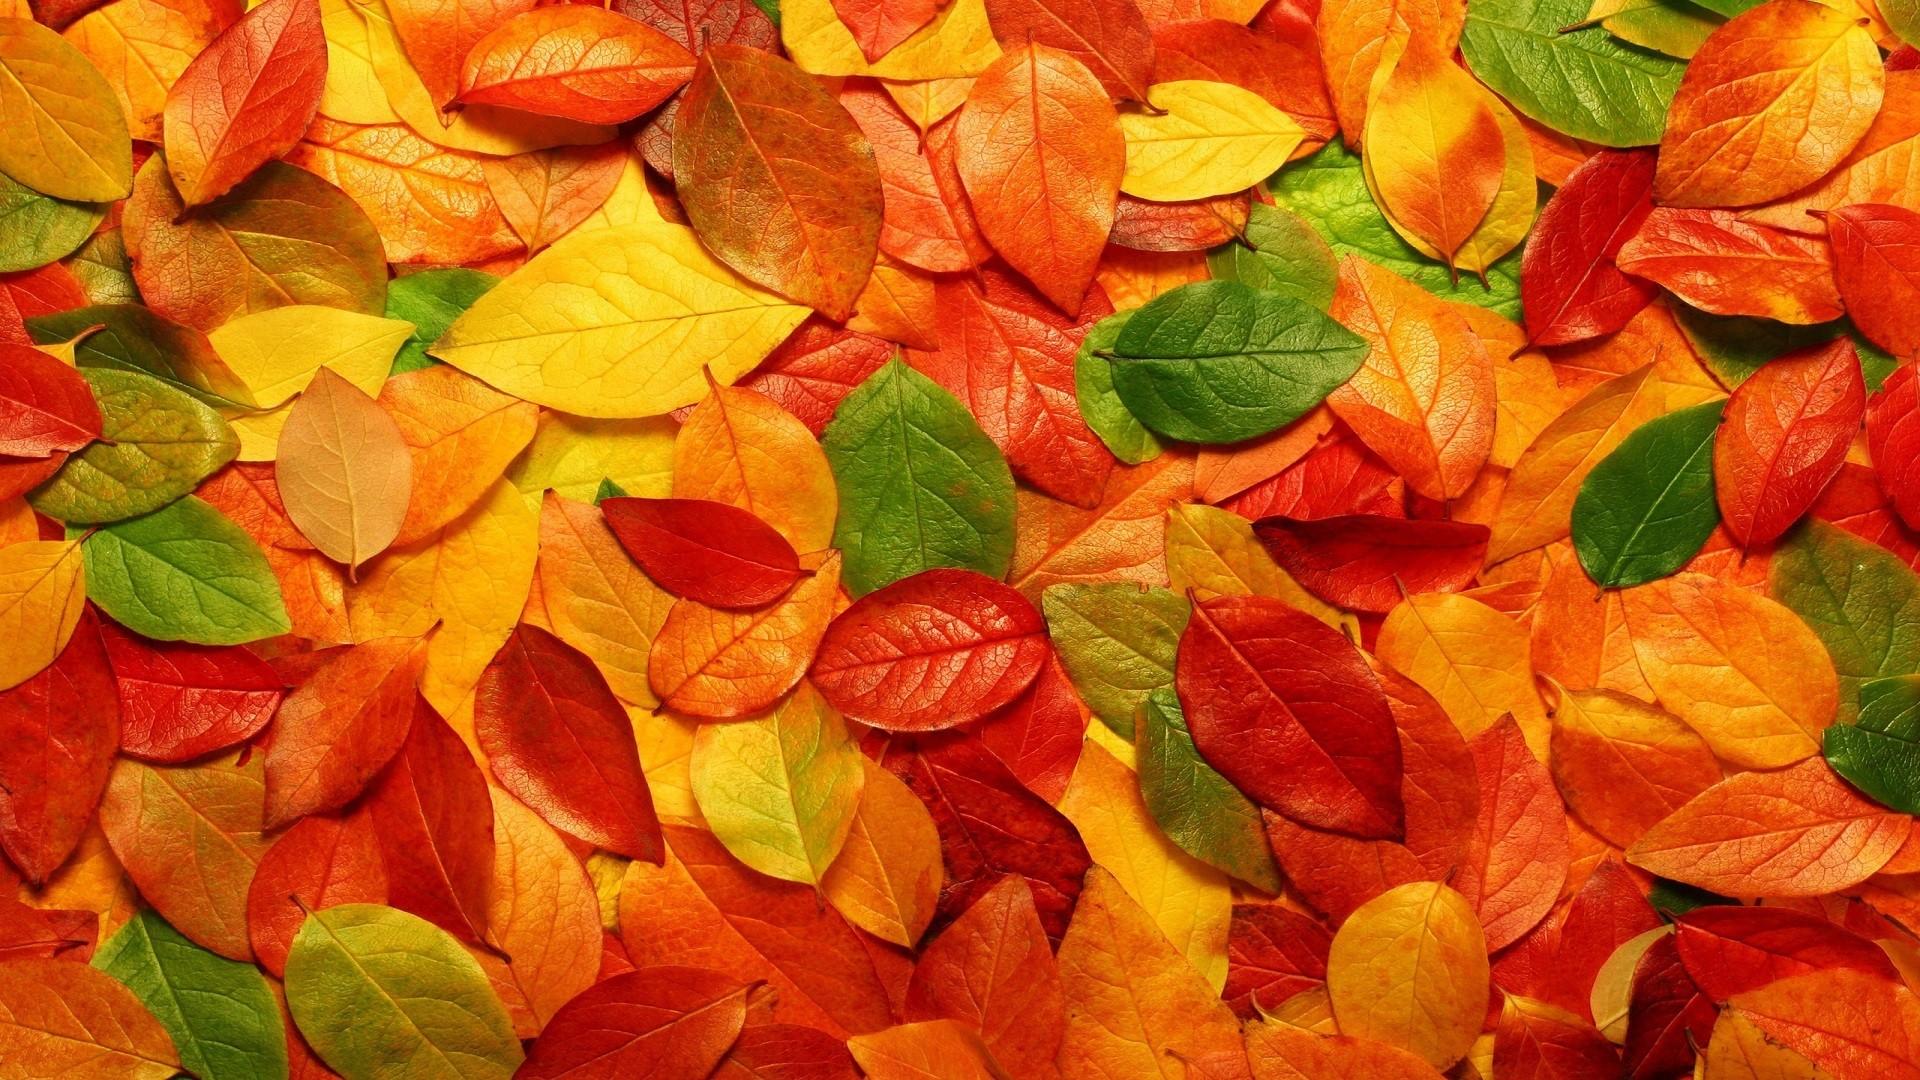 Simple Wallpaper Mac Autumn - 129201-free-autumn-desktop-wallpaper-1920x1080-macbook  Pic_885261.jpg